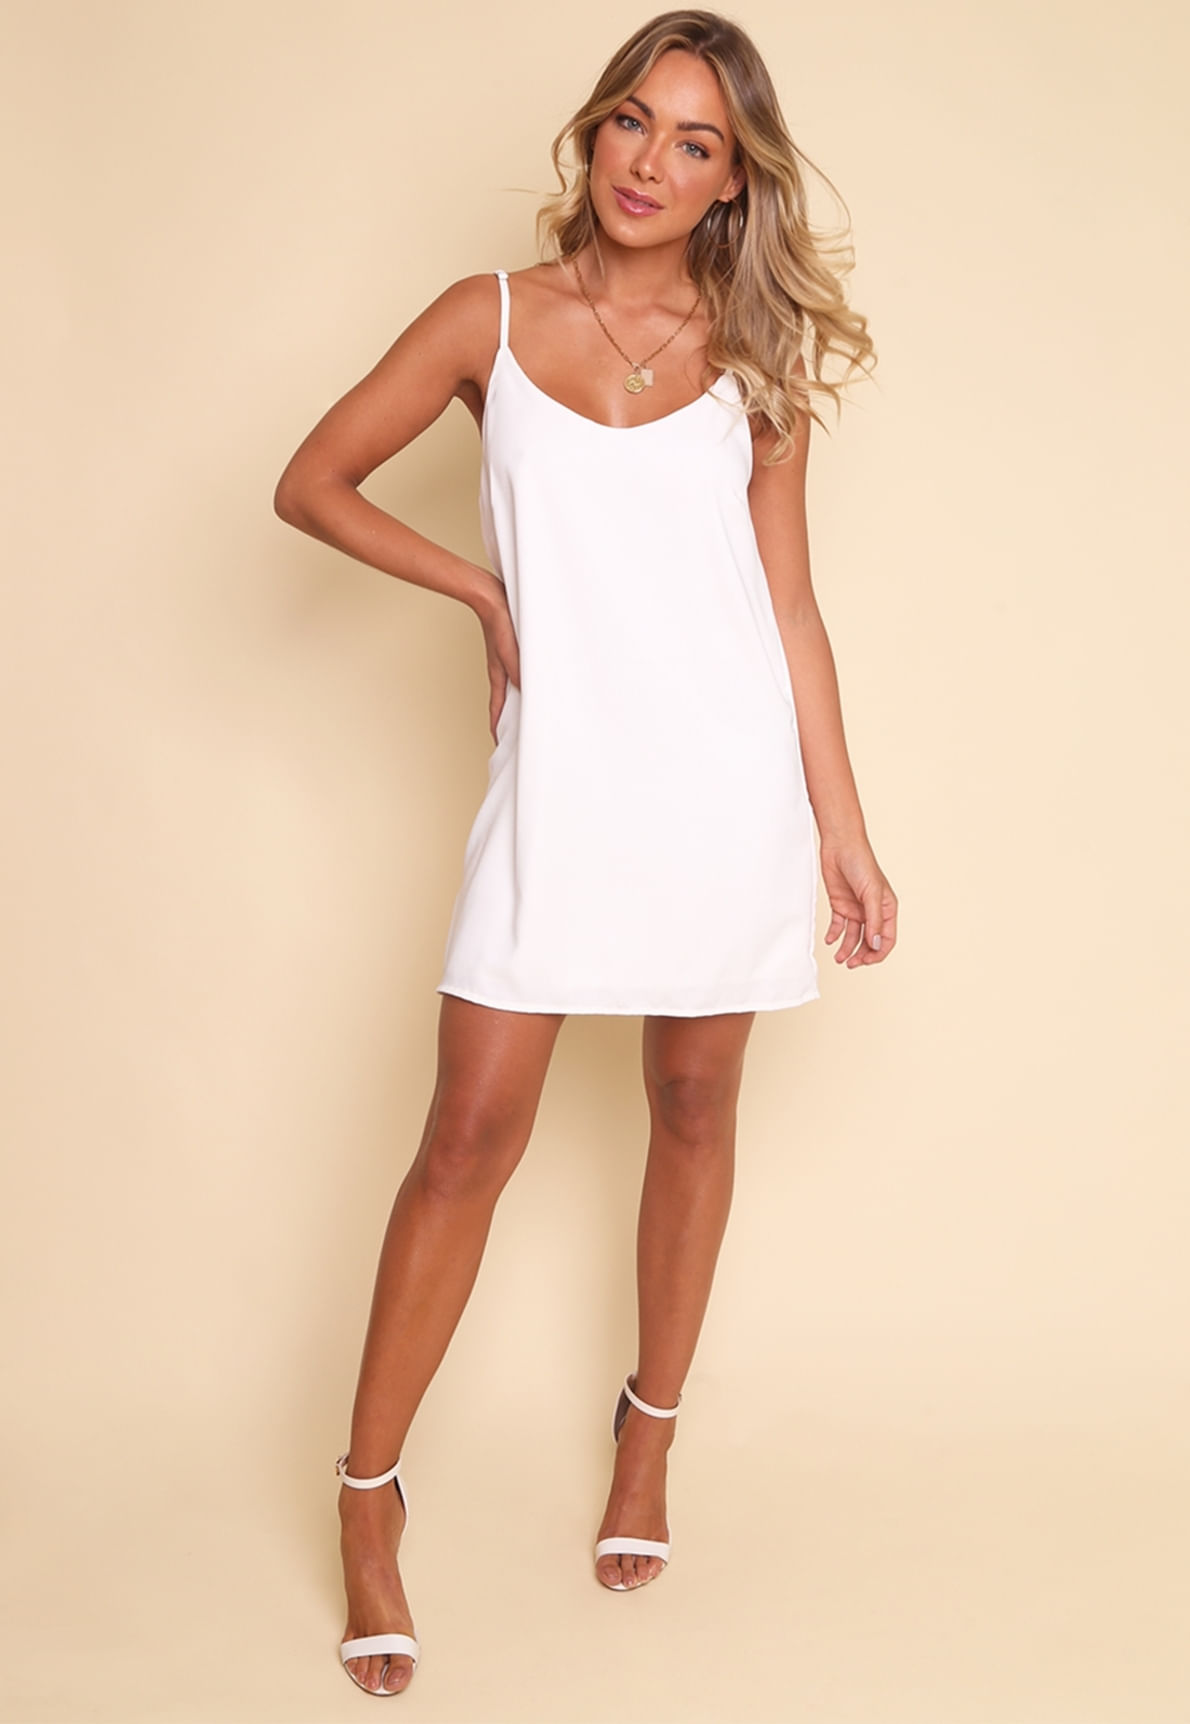 30513-vestido-soltinho-off-white-noronha-mundo-lolita-02.jpg